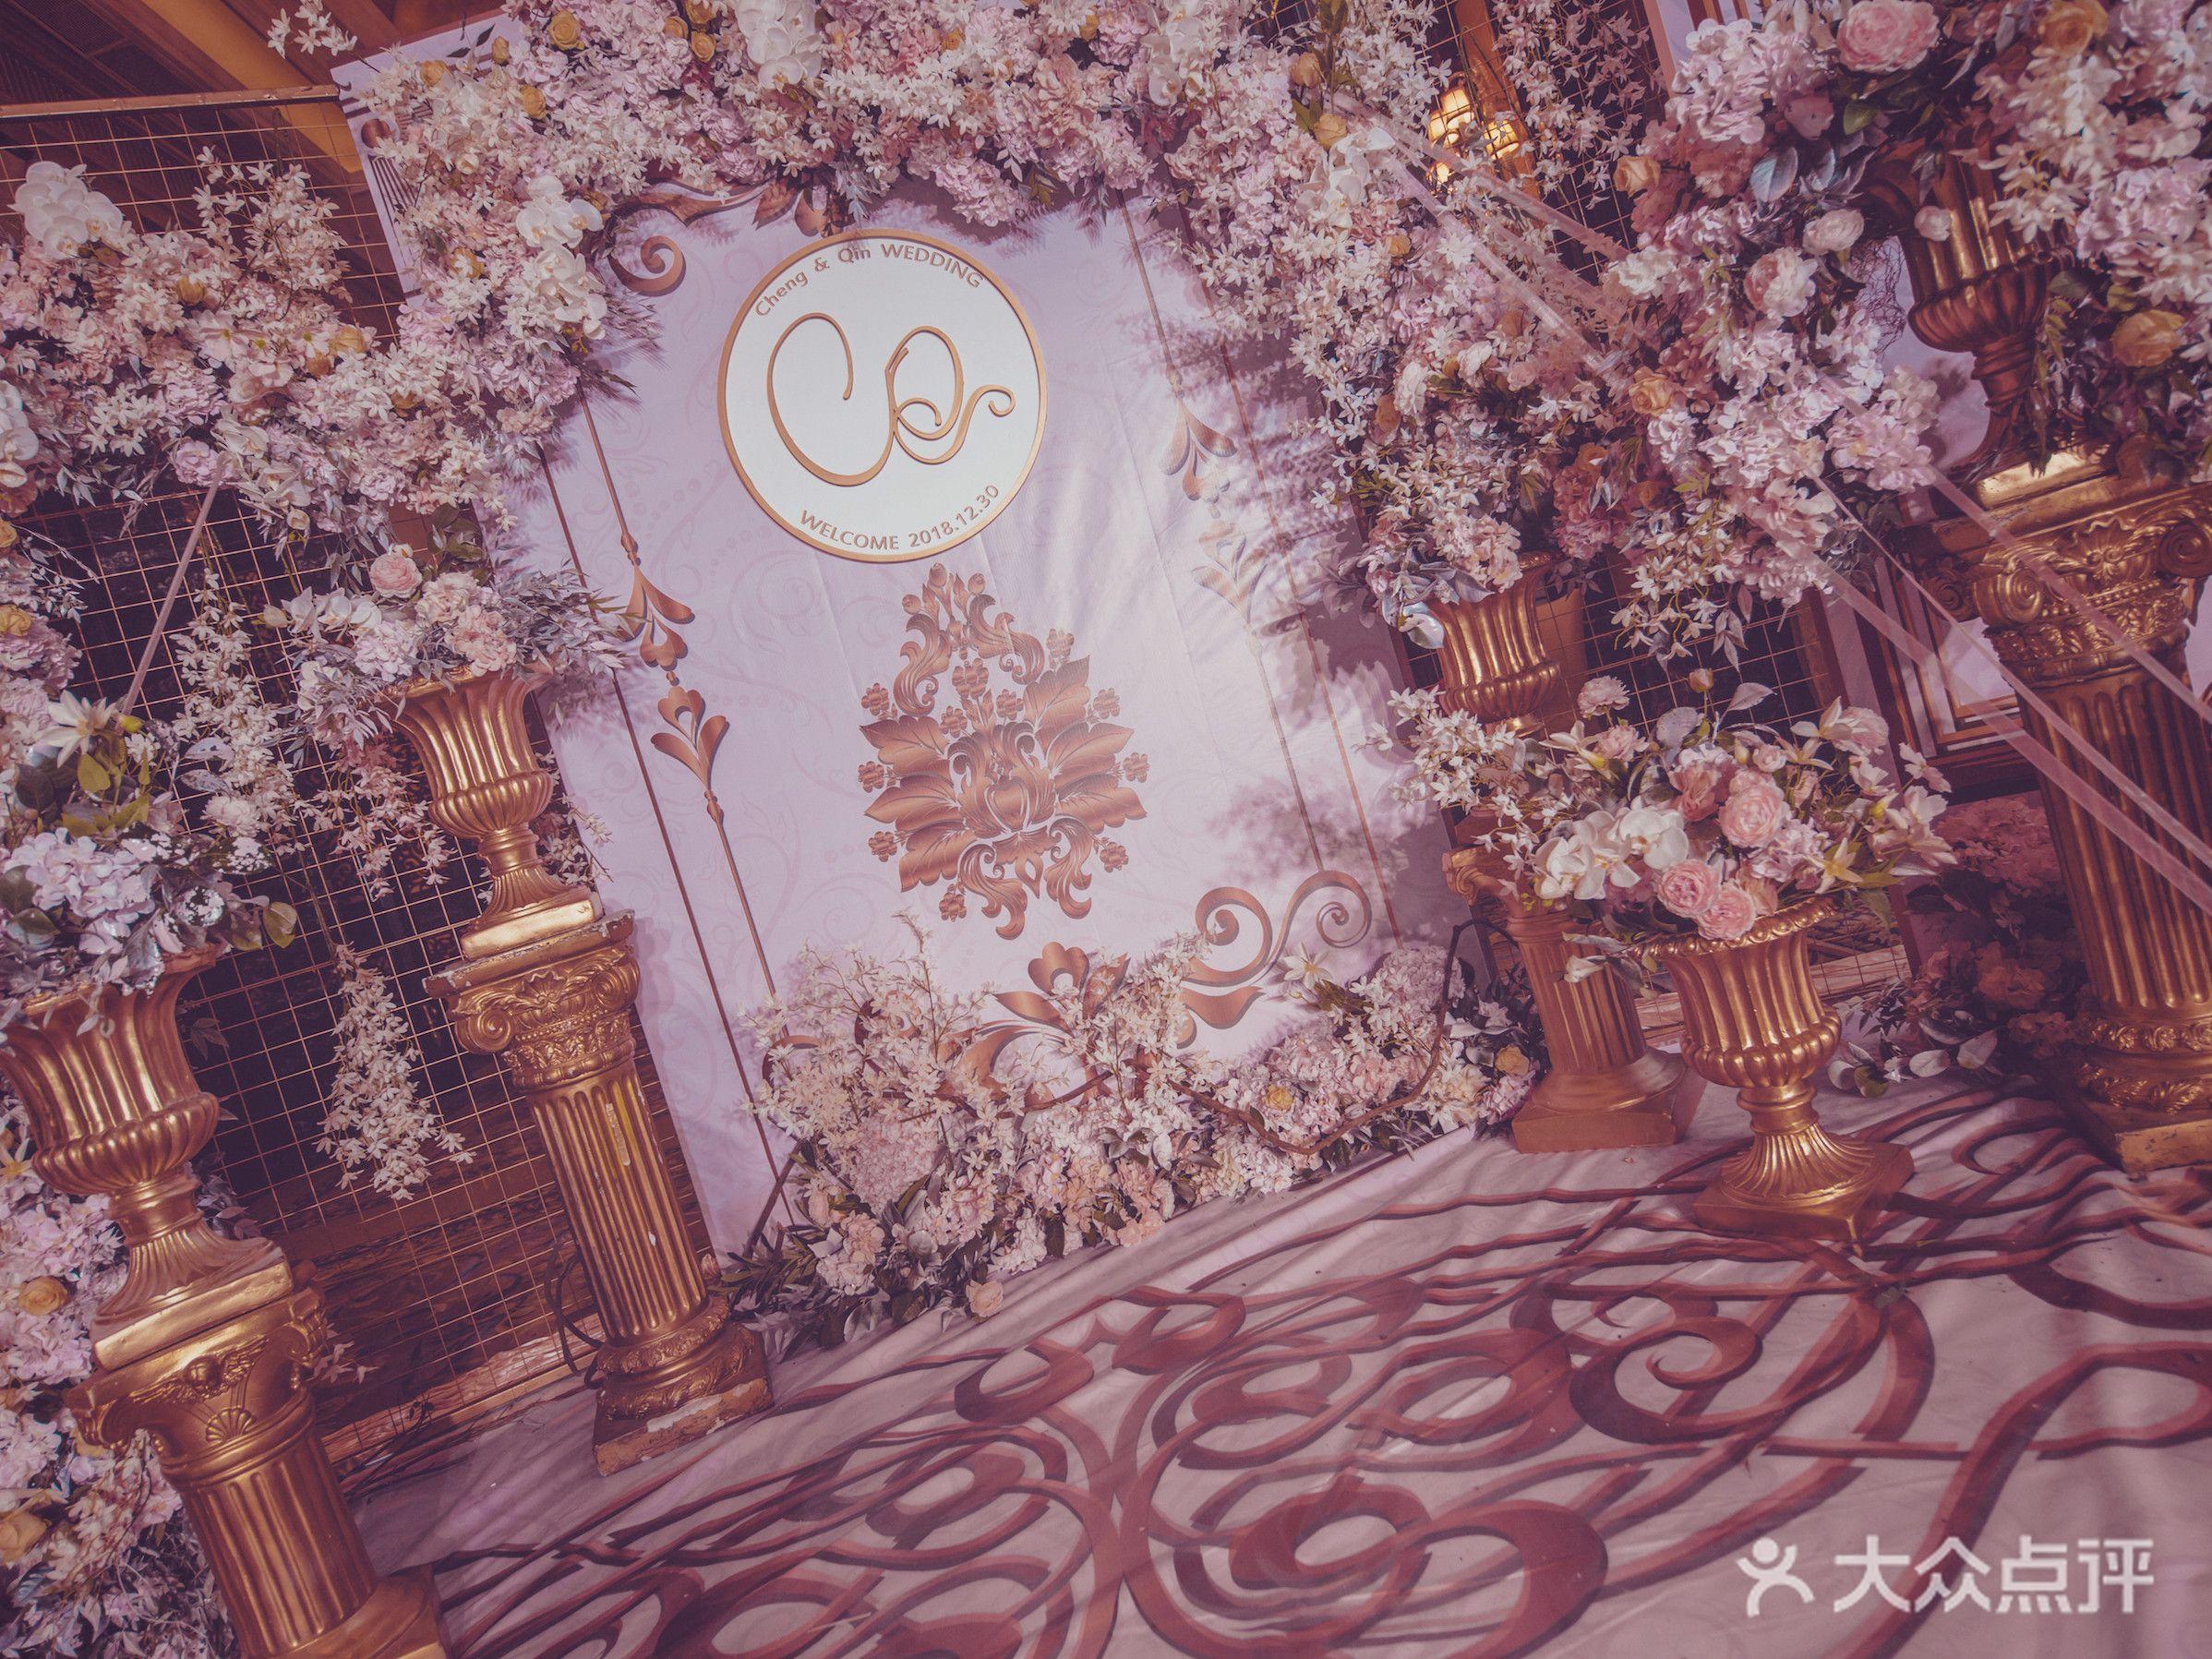 The Moment婚礼策划的图片